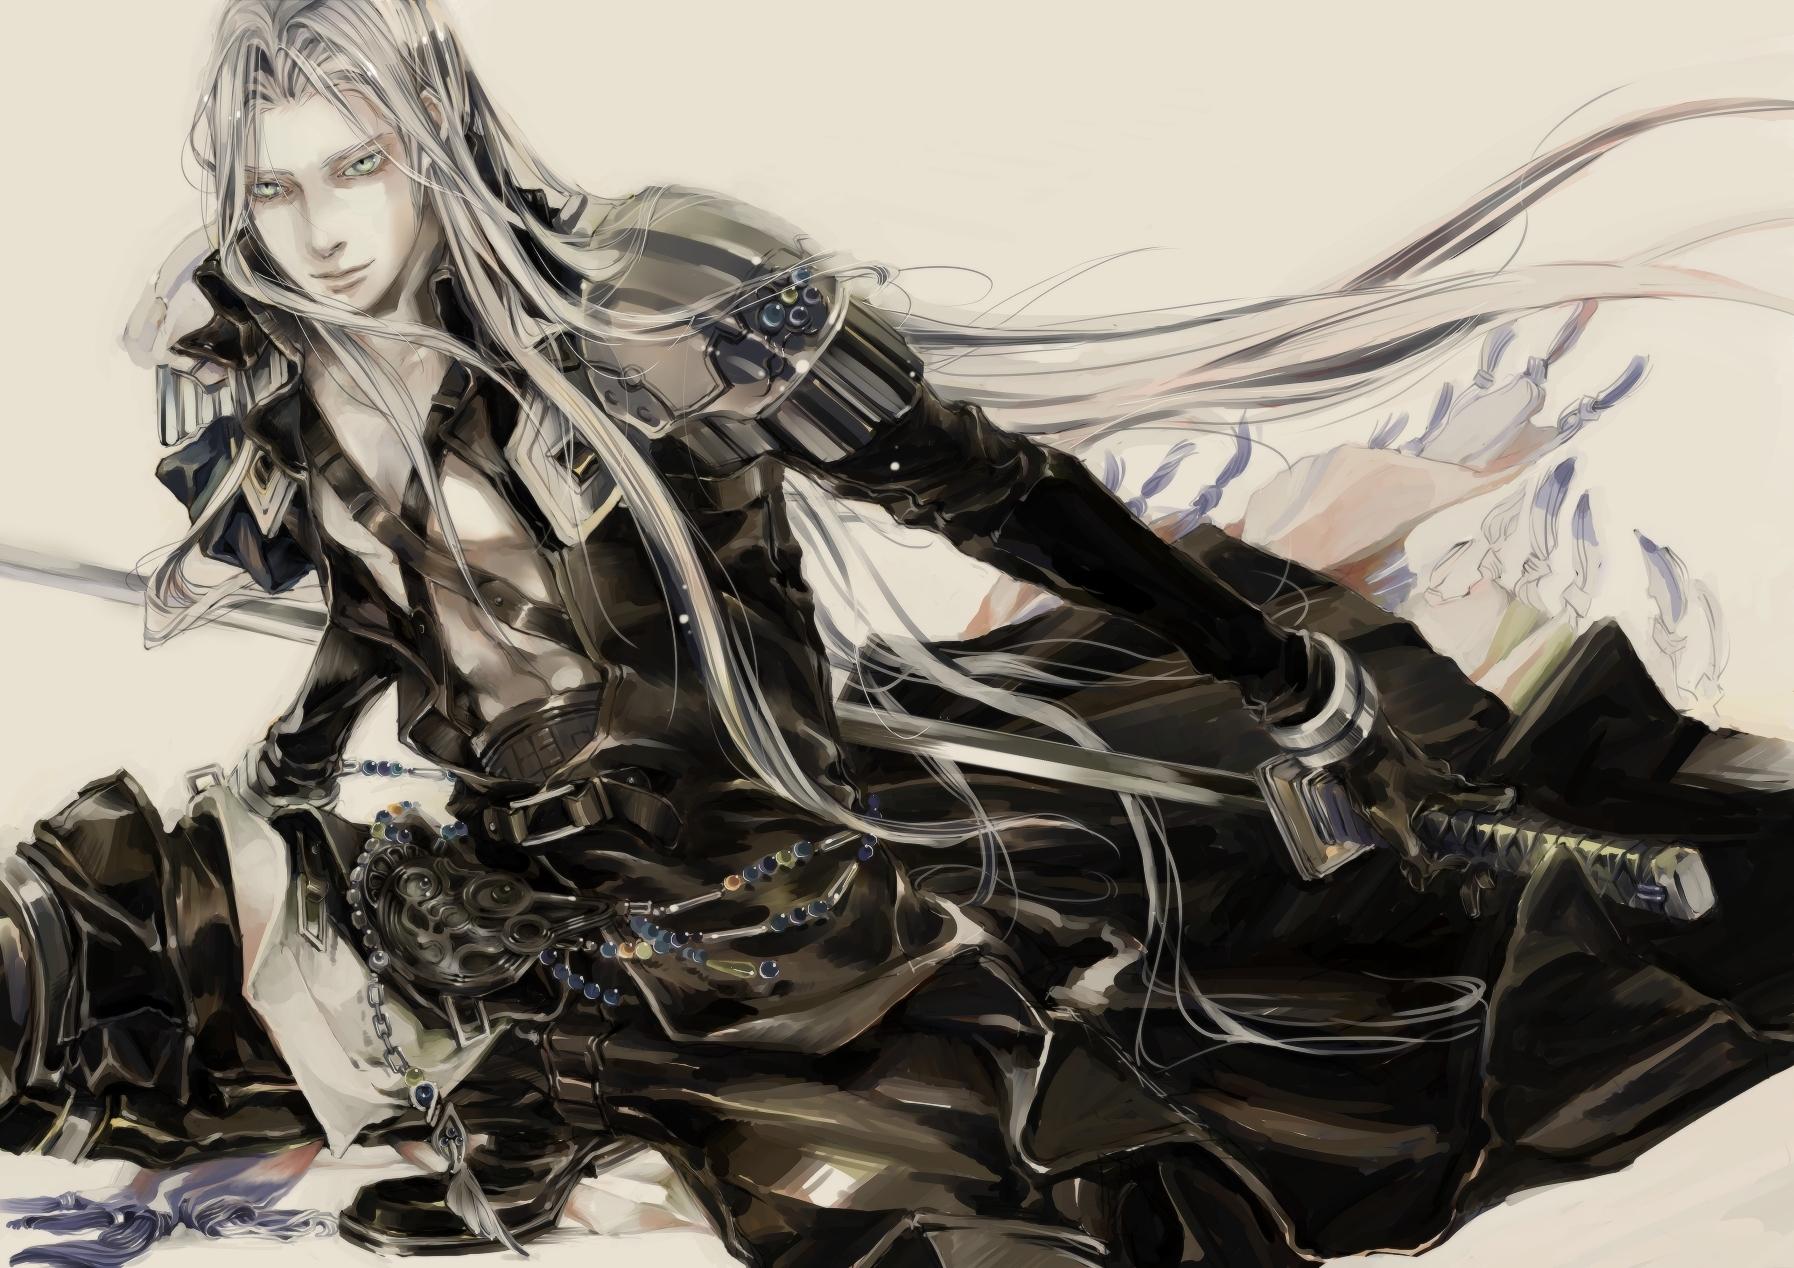 final_fantasy final_fantasy_vii sephiroth